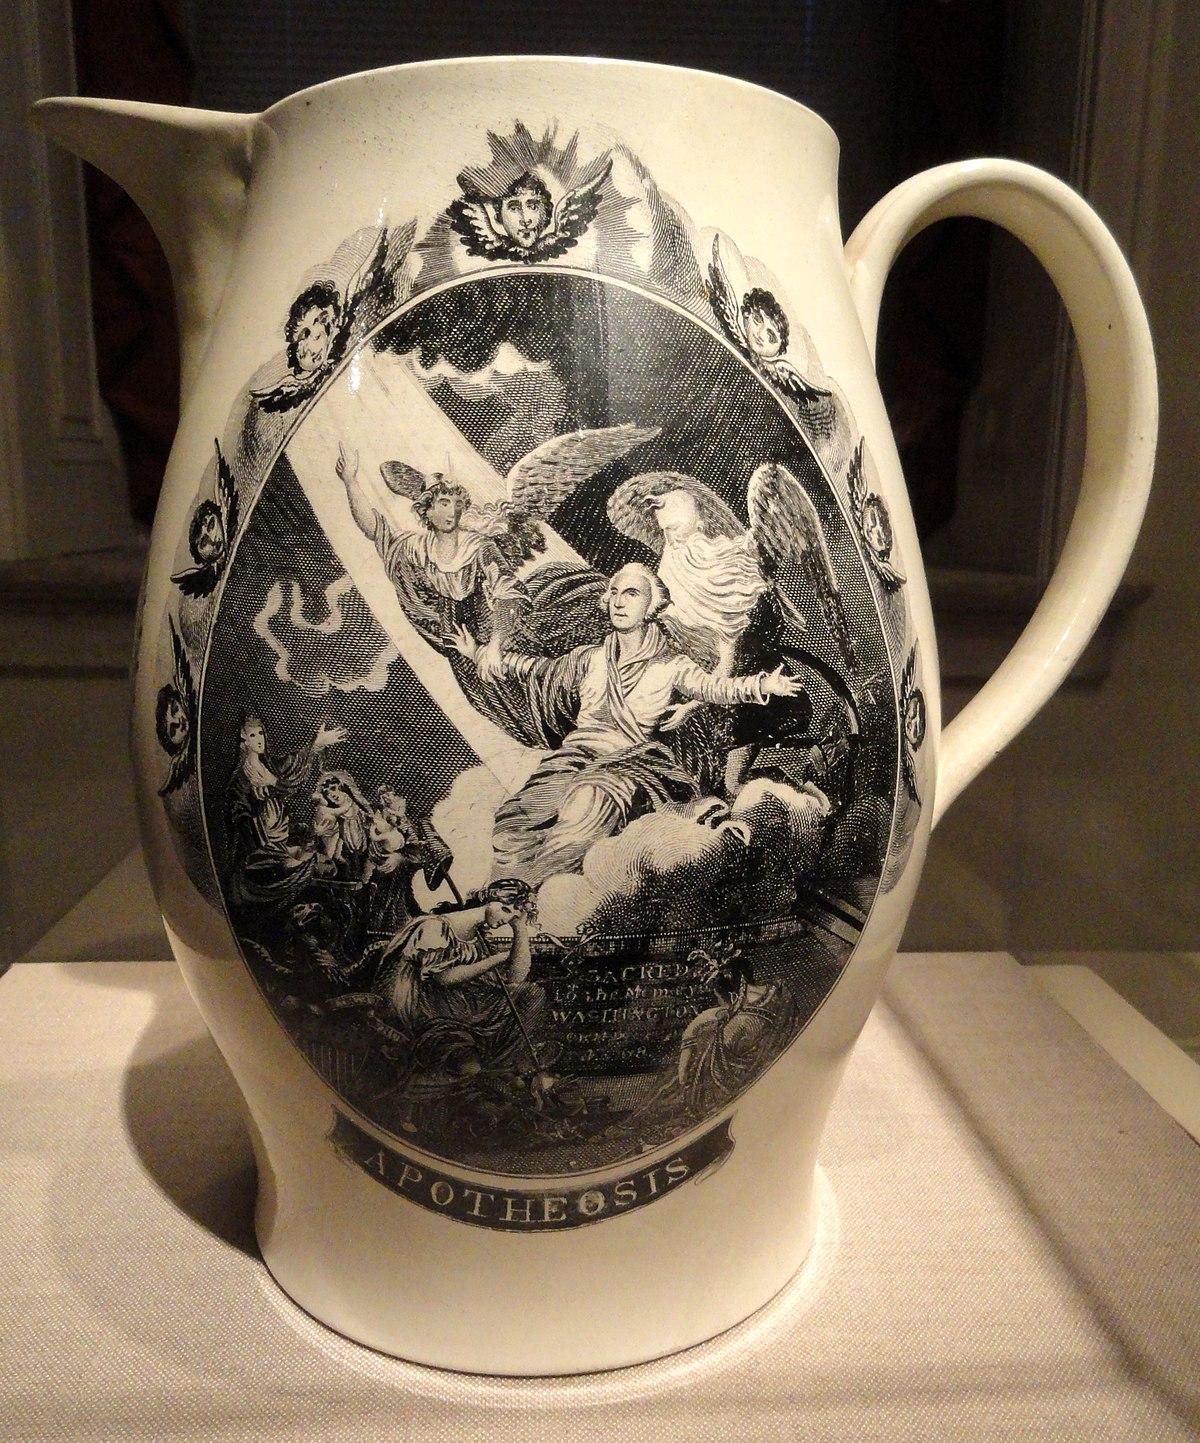 Herculaneum Pottery - Wikipedia